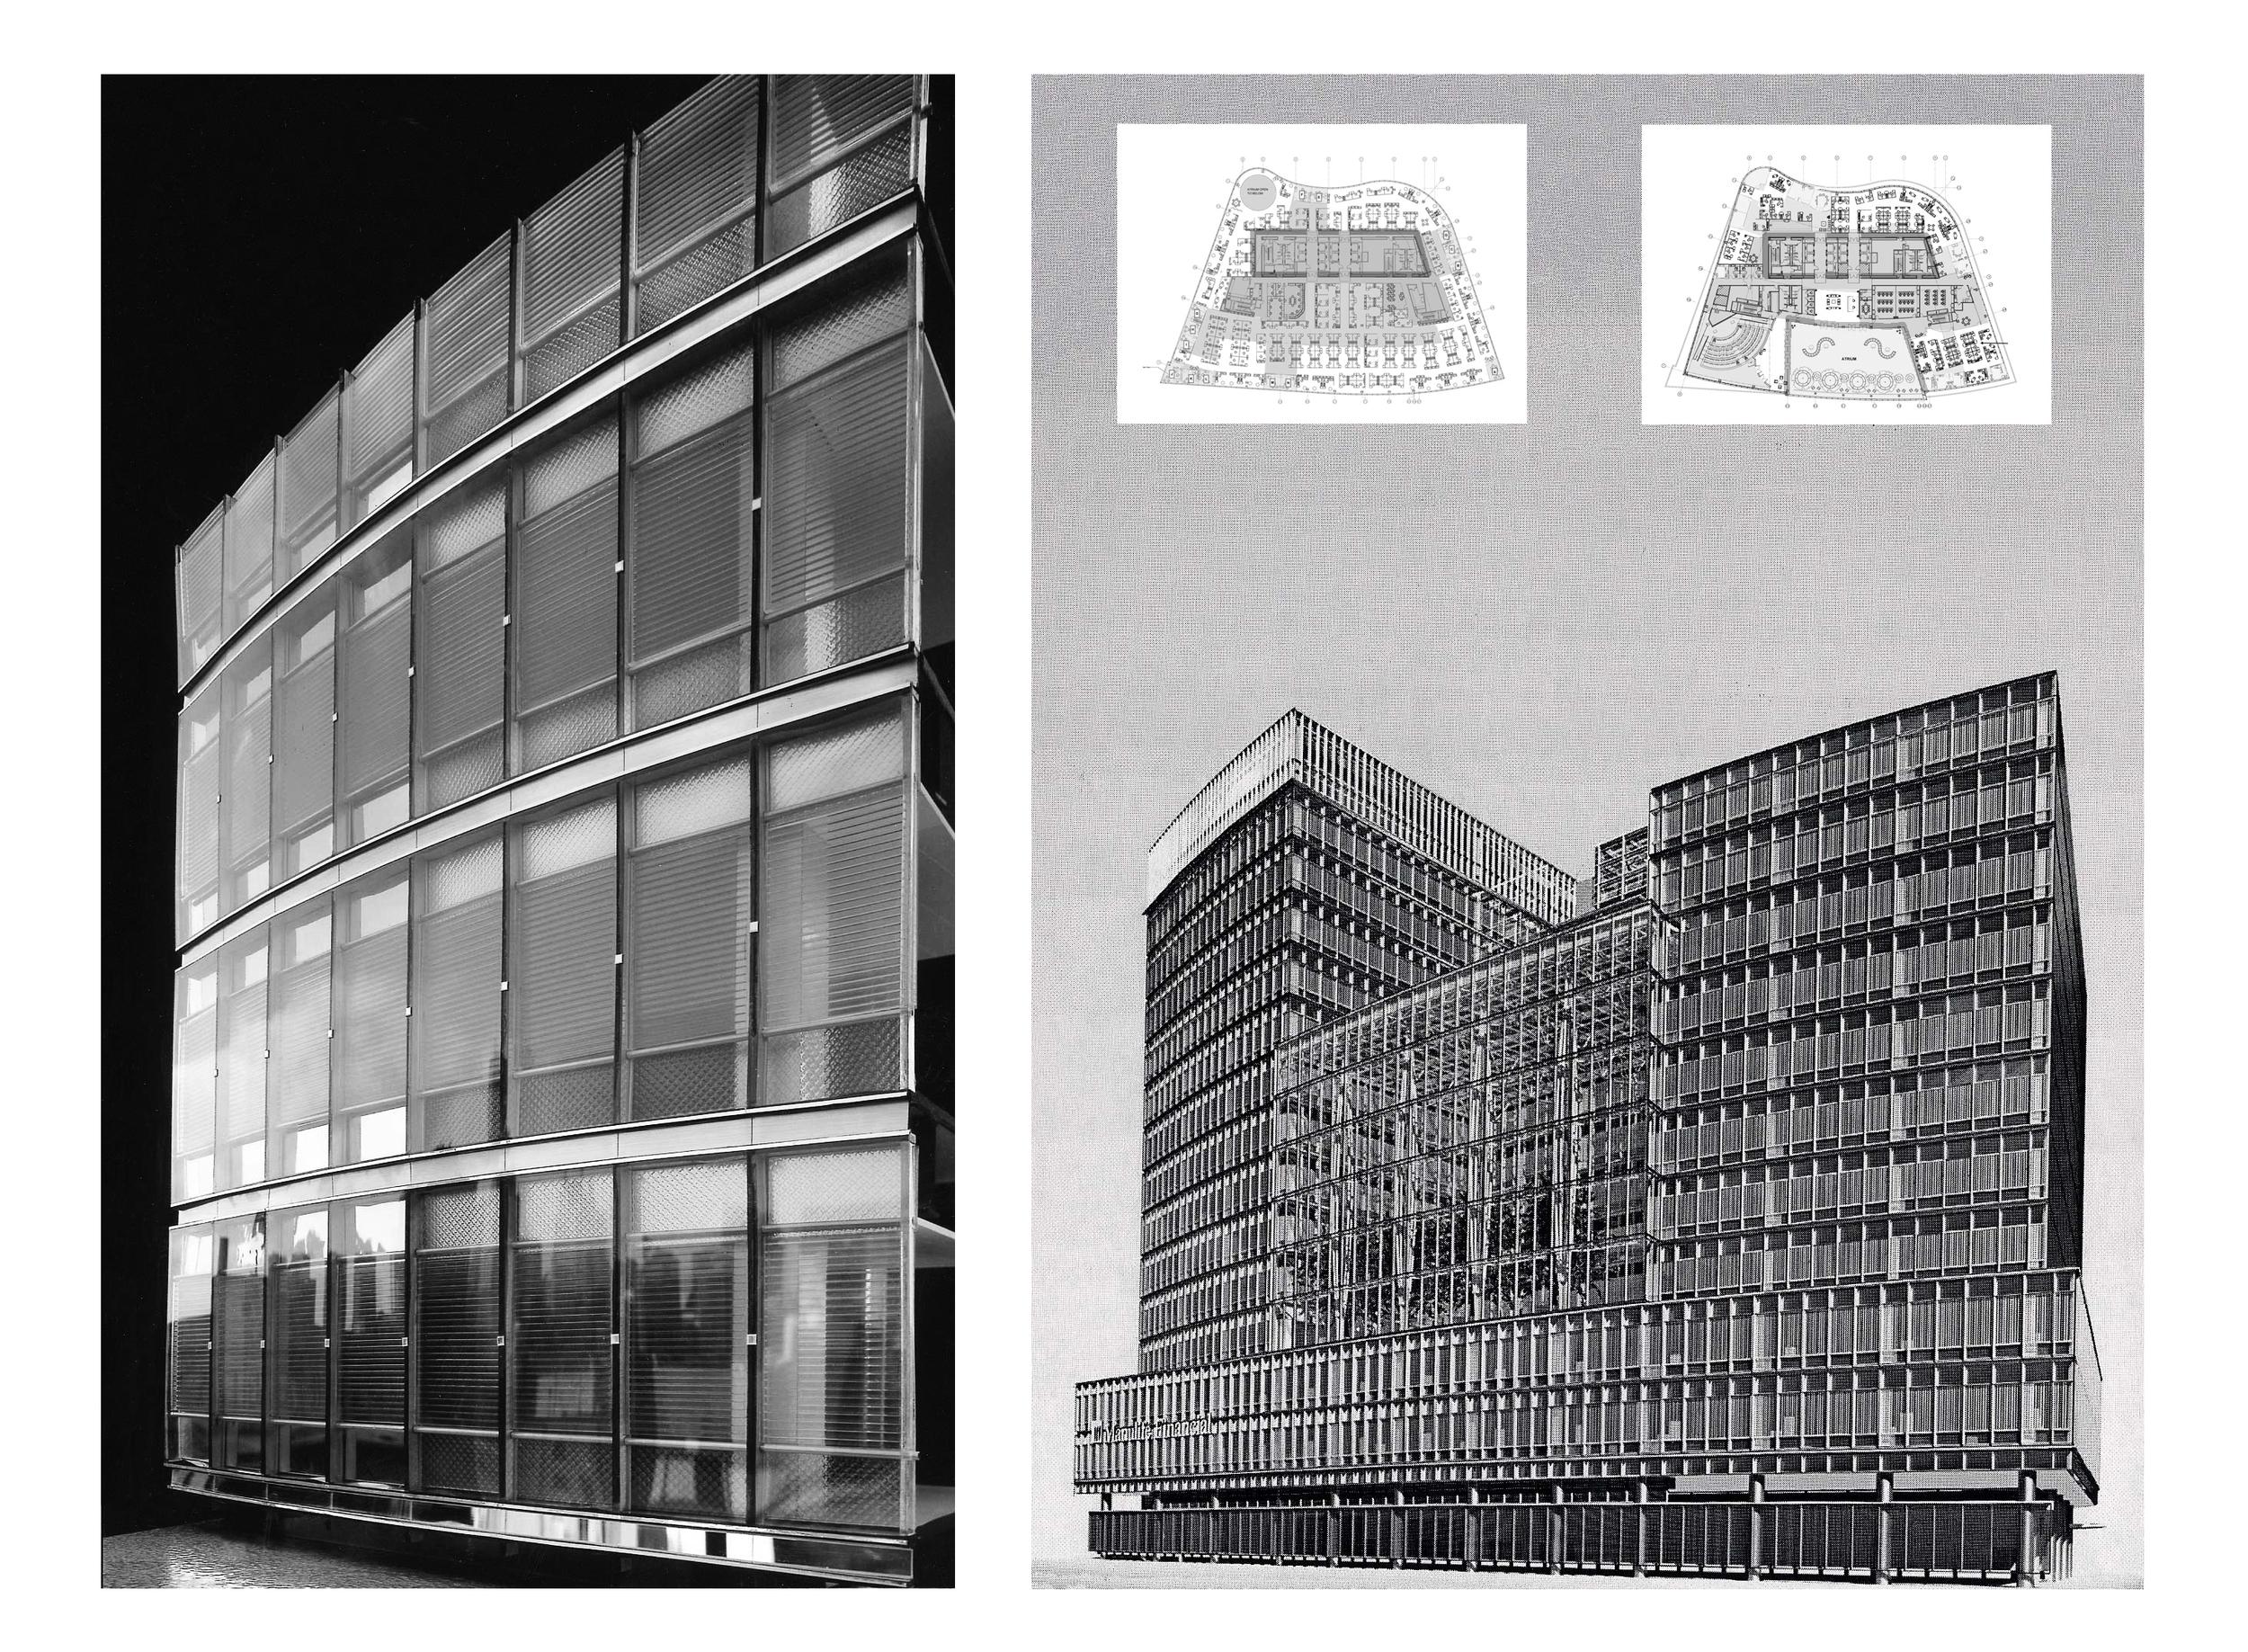 12     DESIGN: TODD HALAMKA     ARCHITECT: SOM